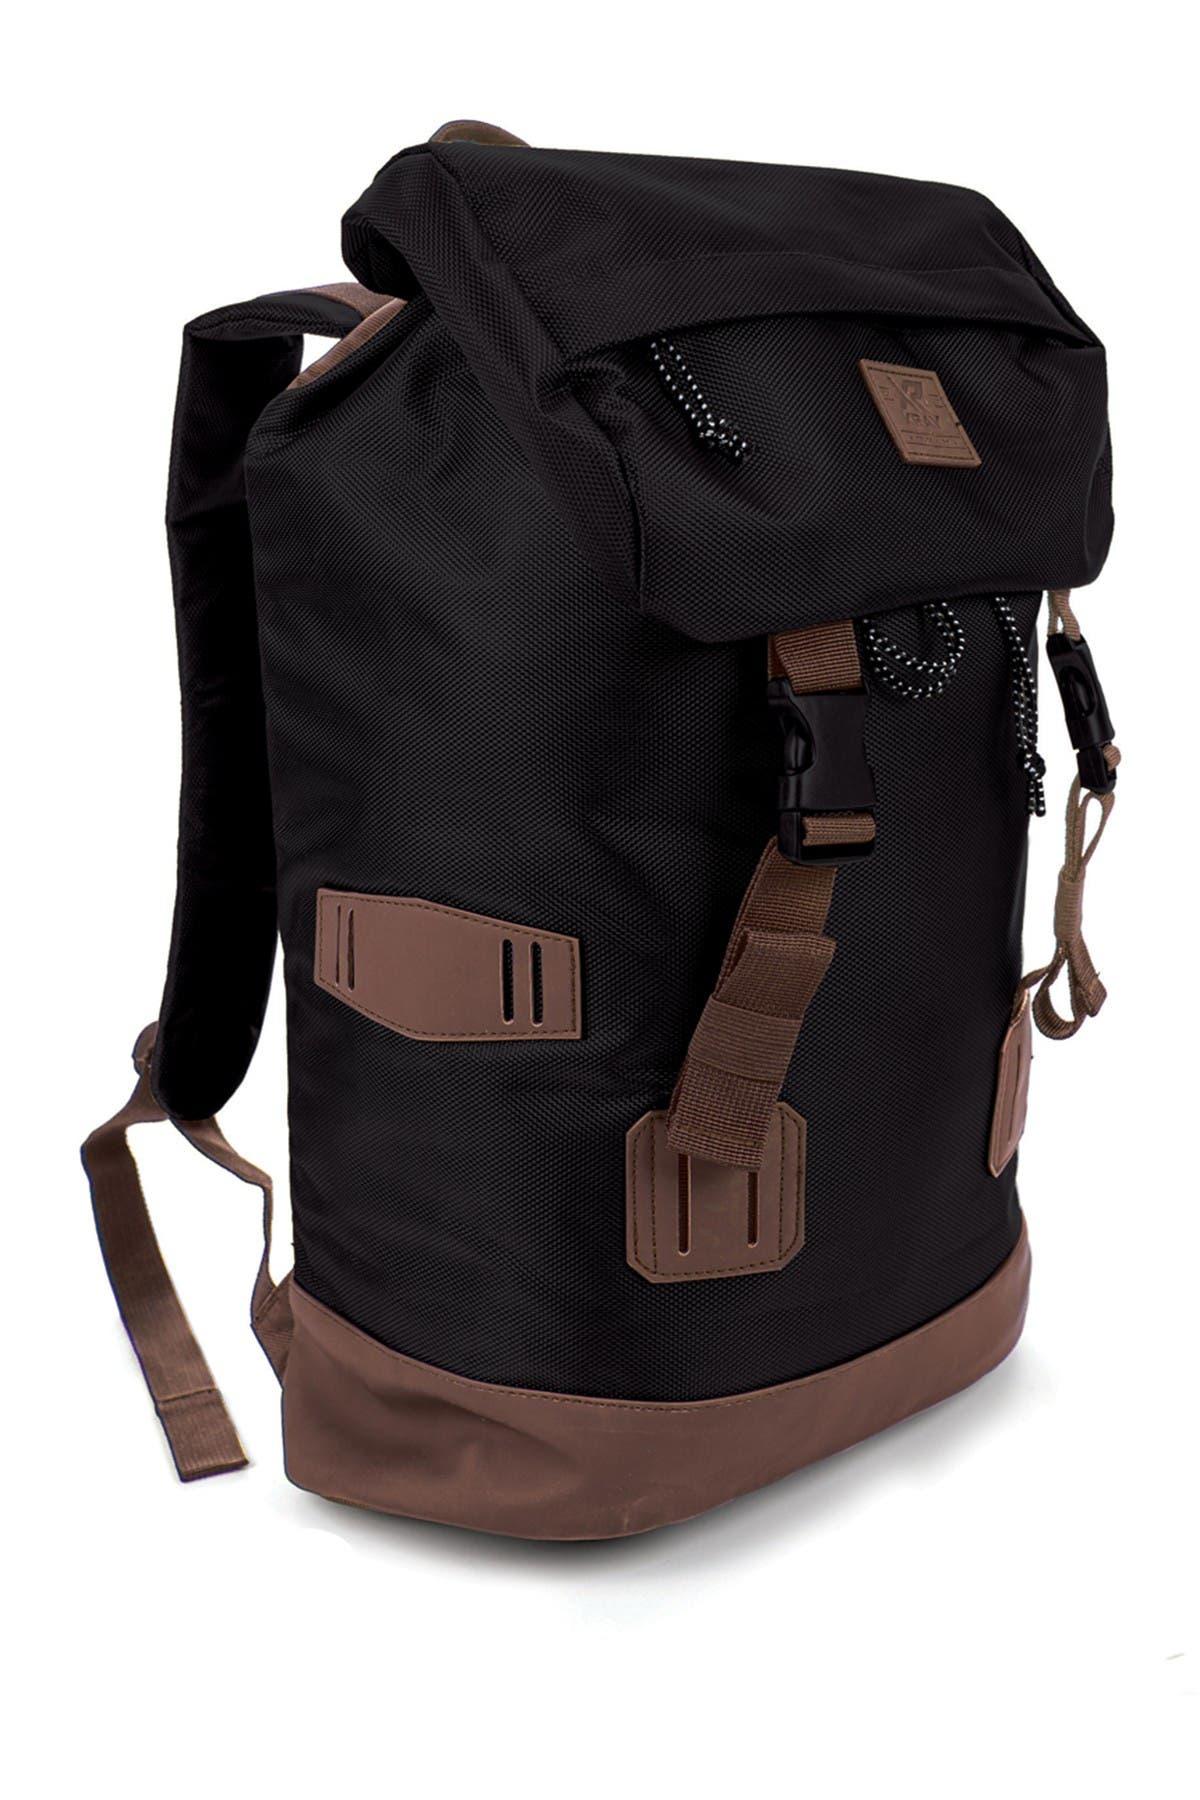 Image of XRAY Water Resistant Rucksack Duffel Backpack